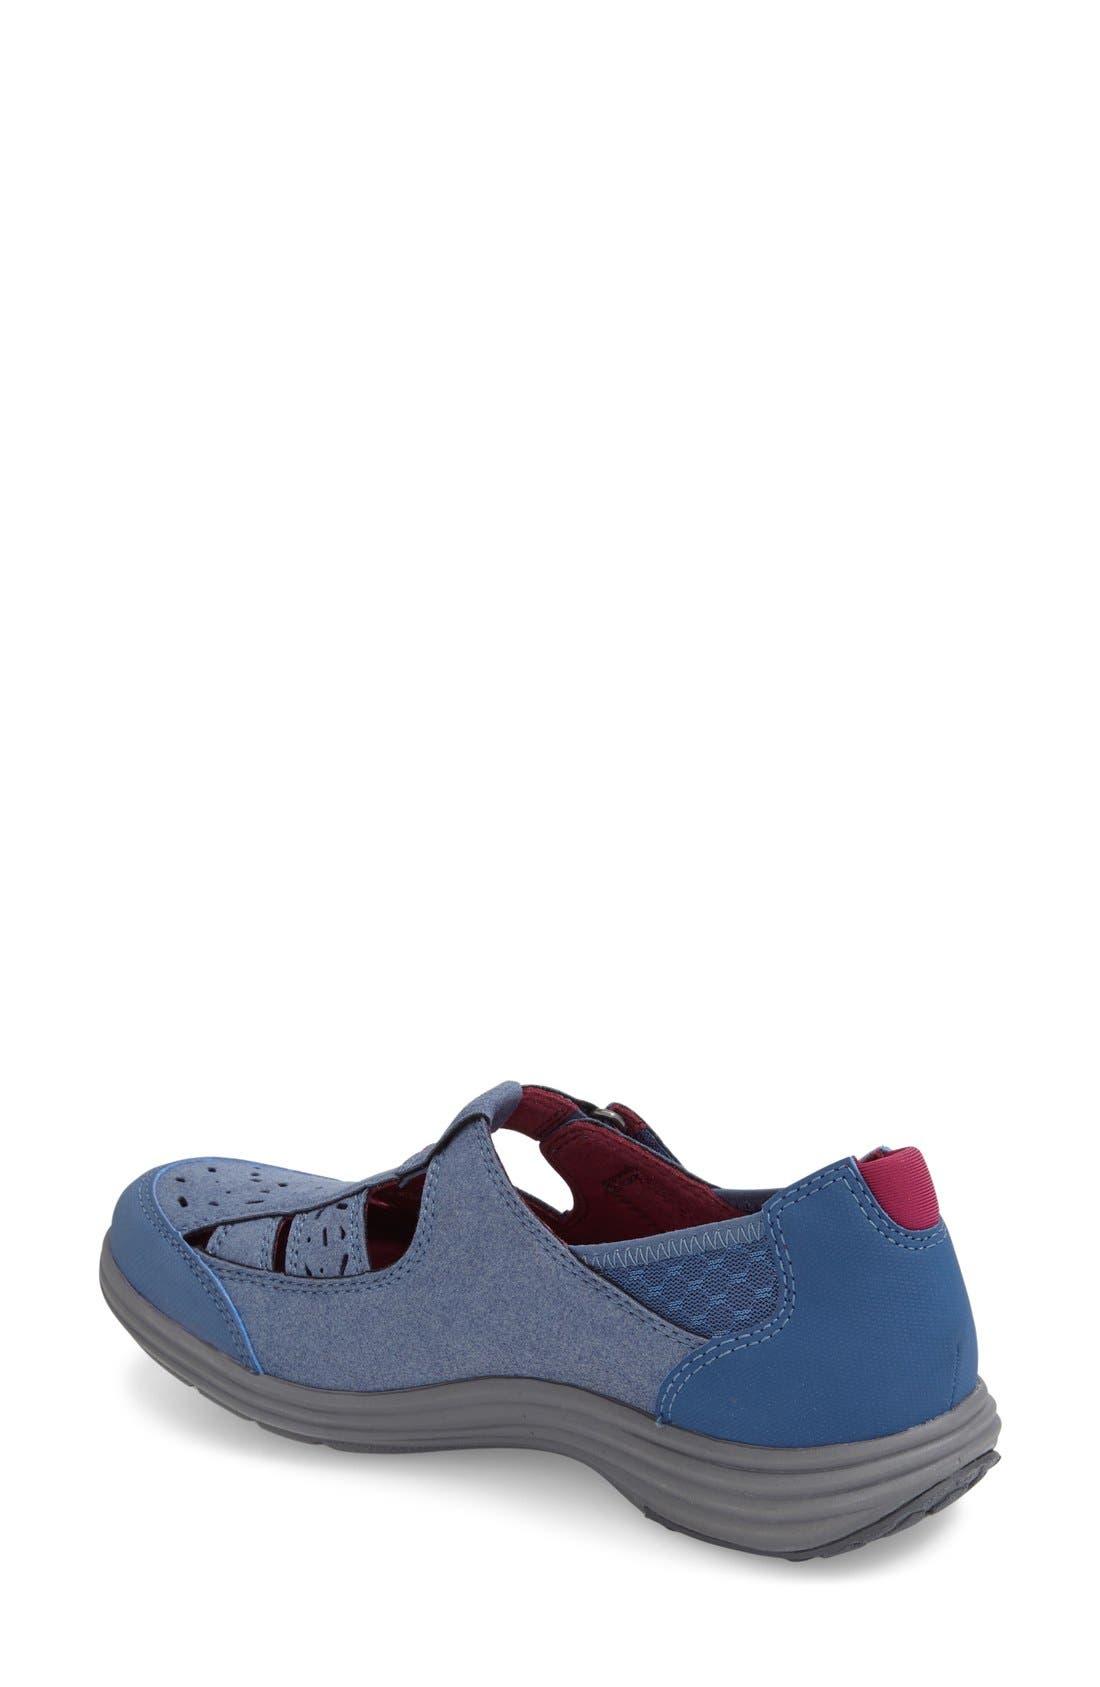 Alternate Image 2  - Aravon 'Barbara' Sneaker (Women)